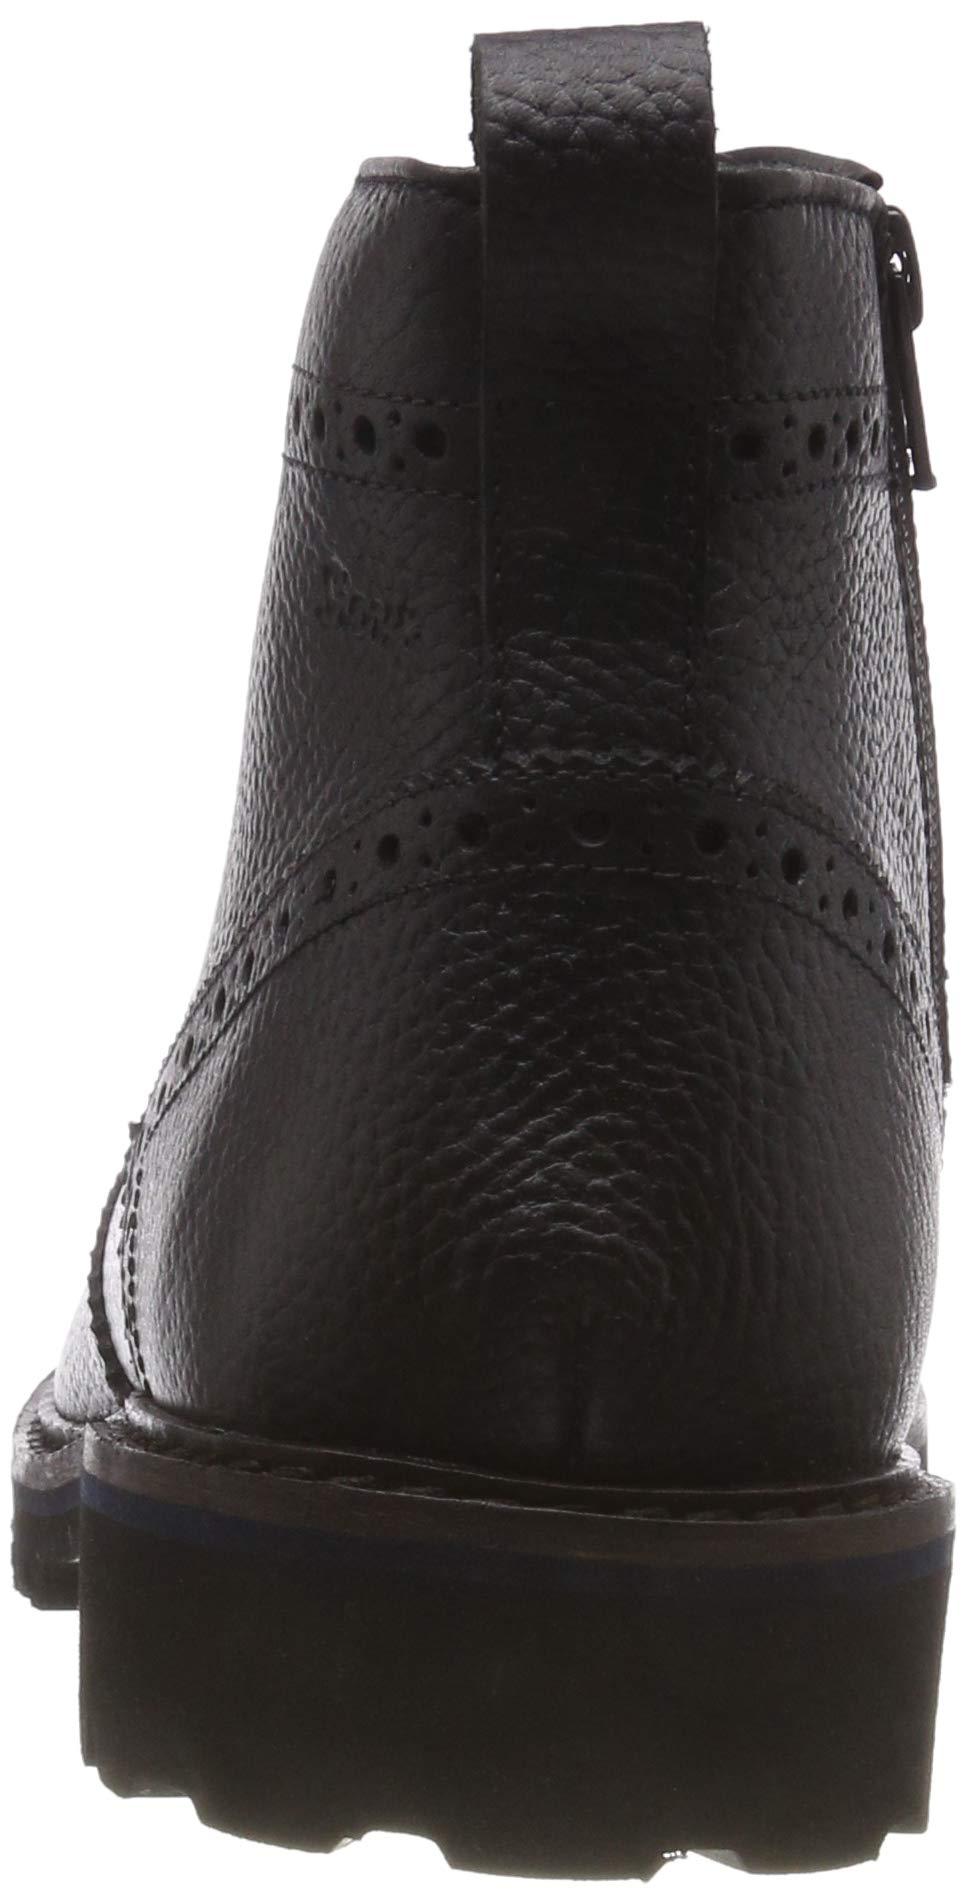 Sioux Herren Quendron-708 Klassische Stiefel